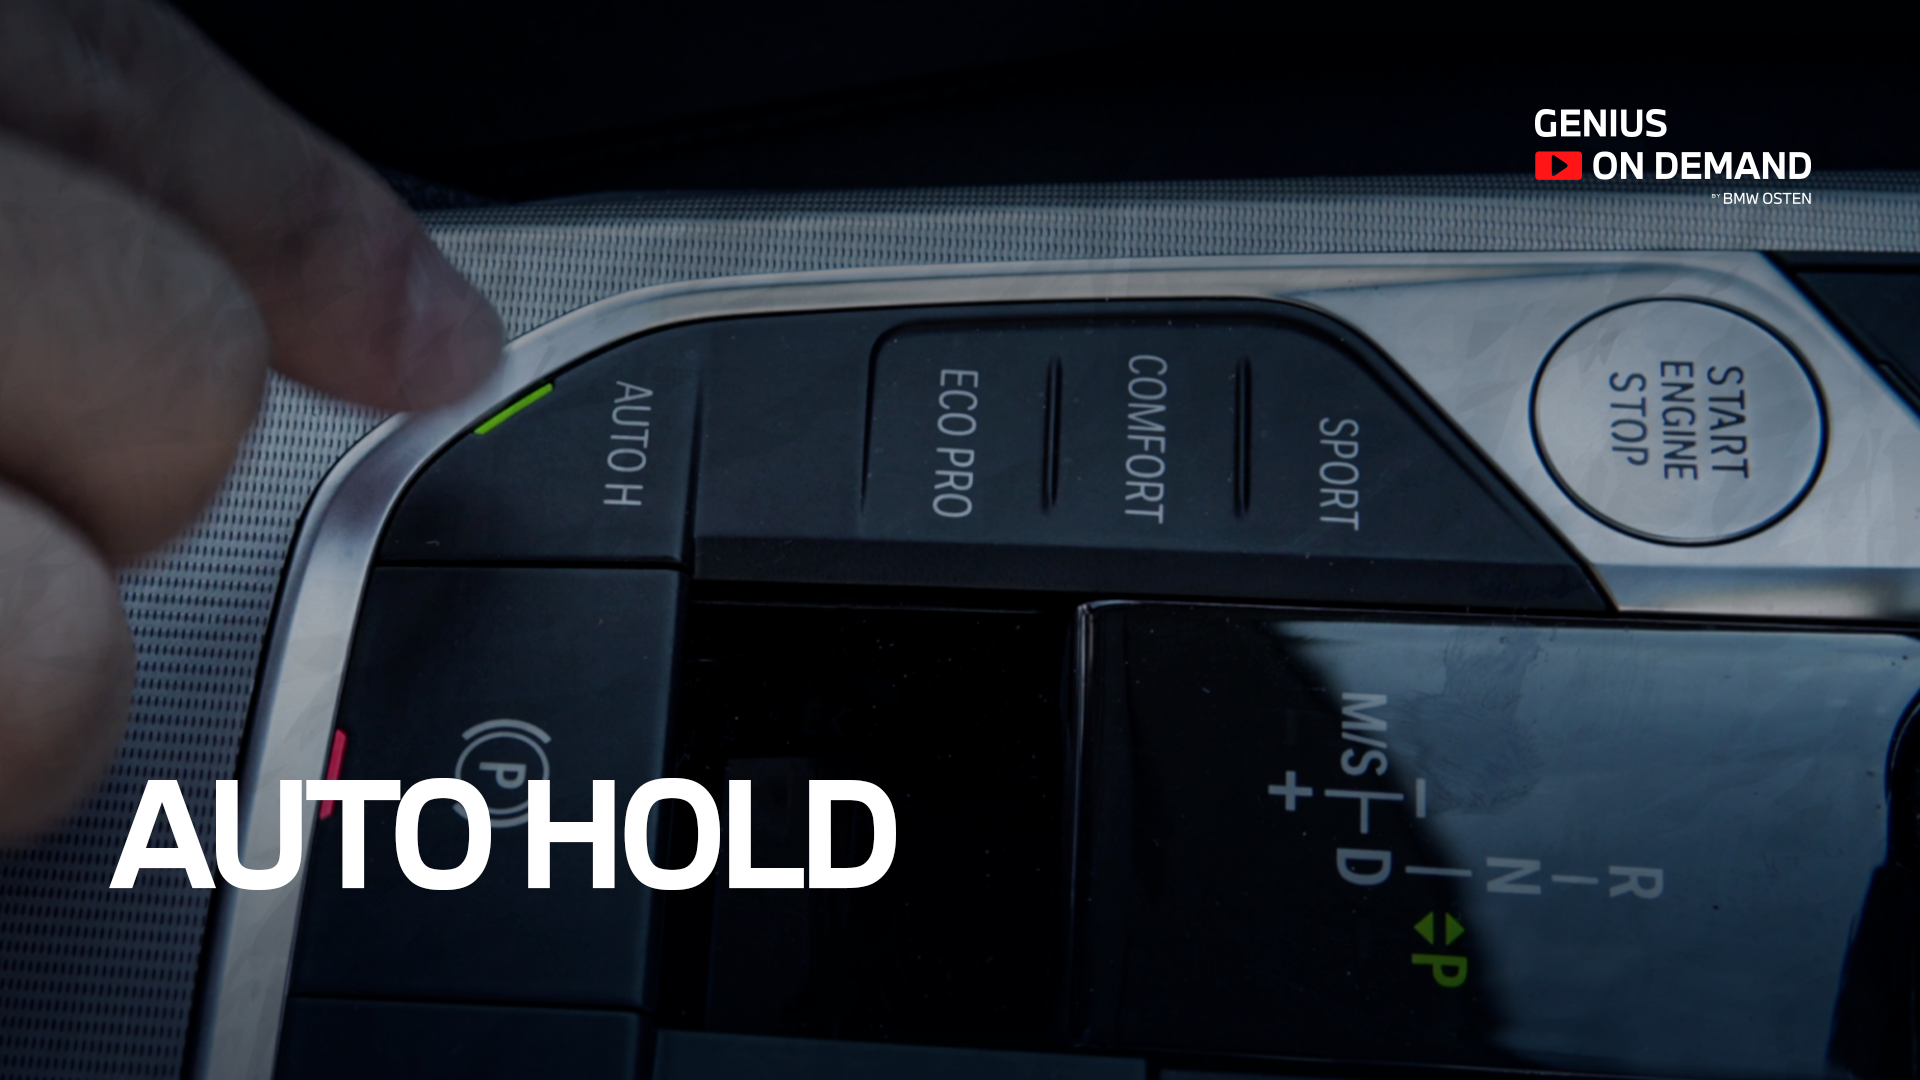 Auto Hold